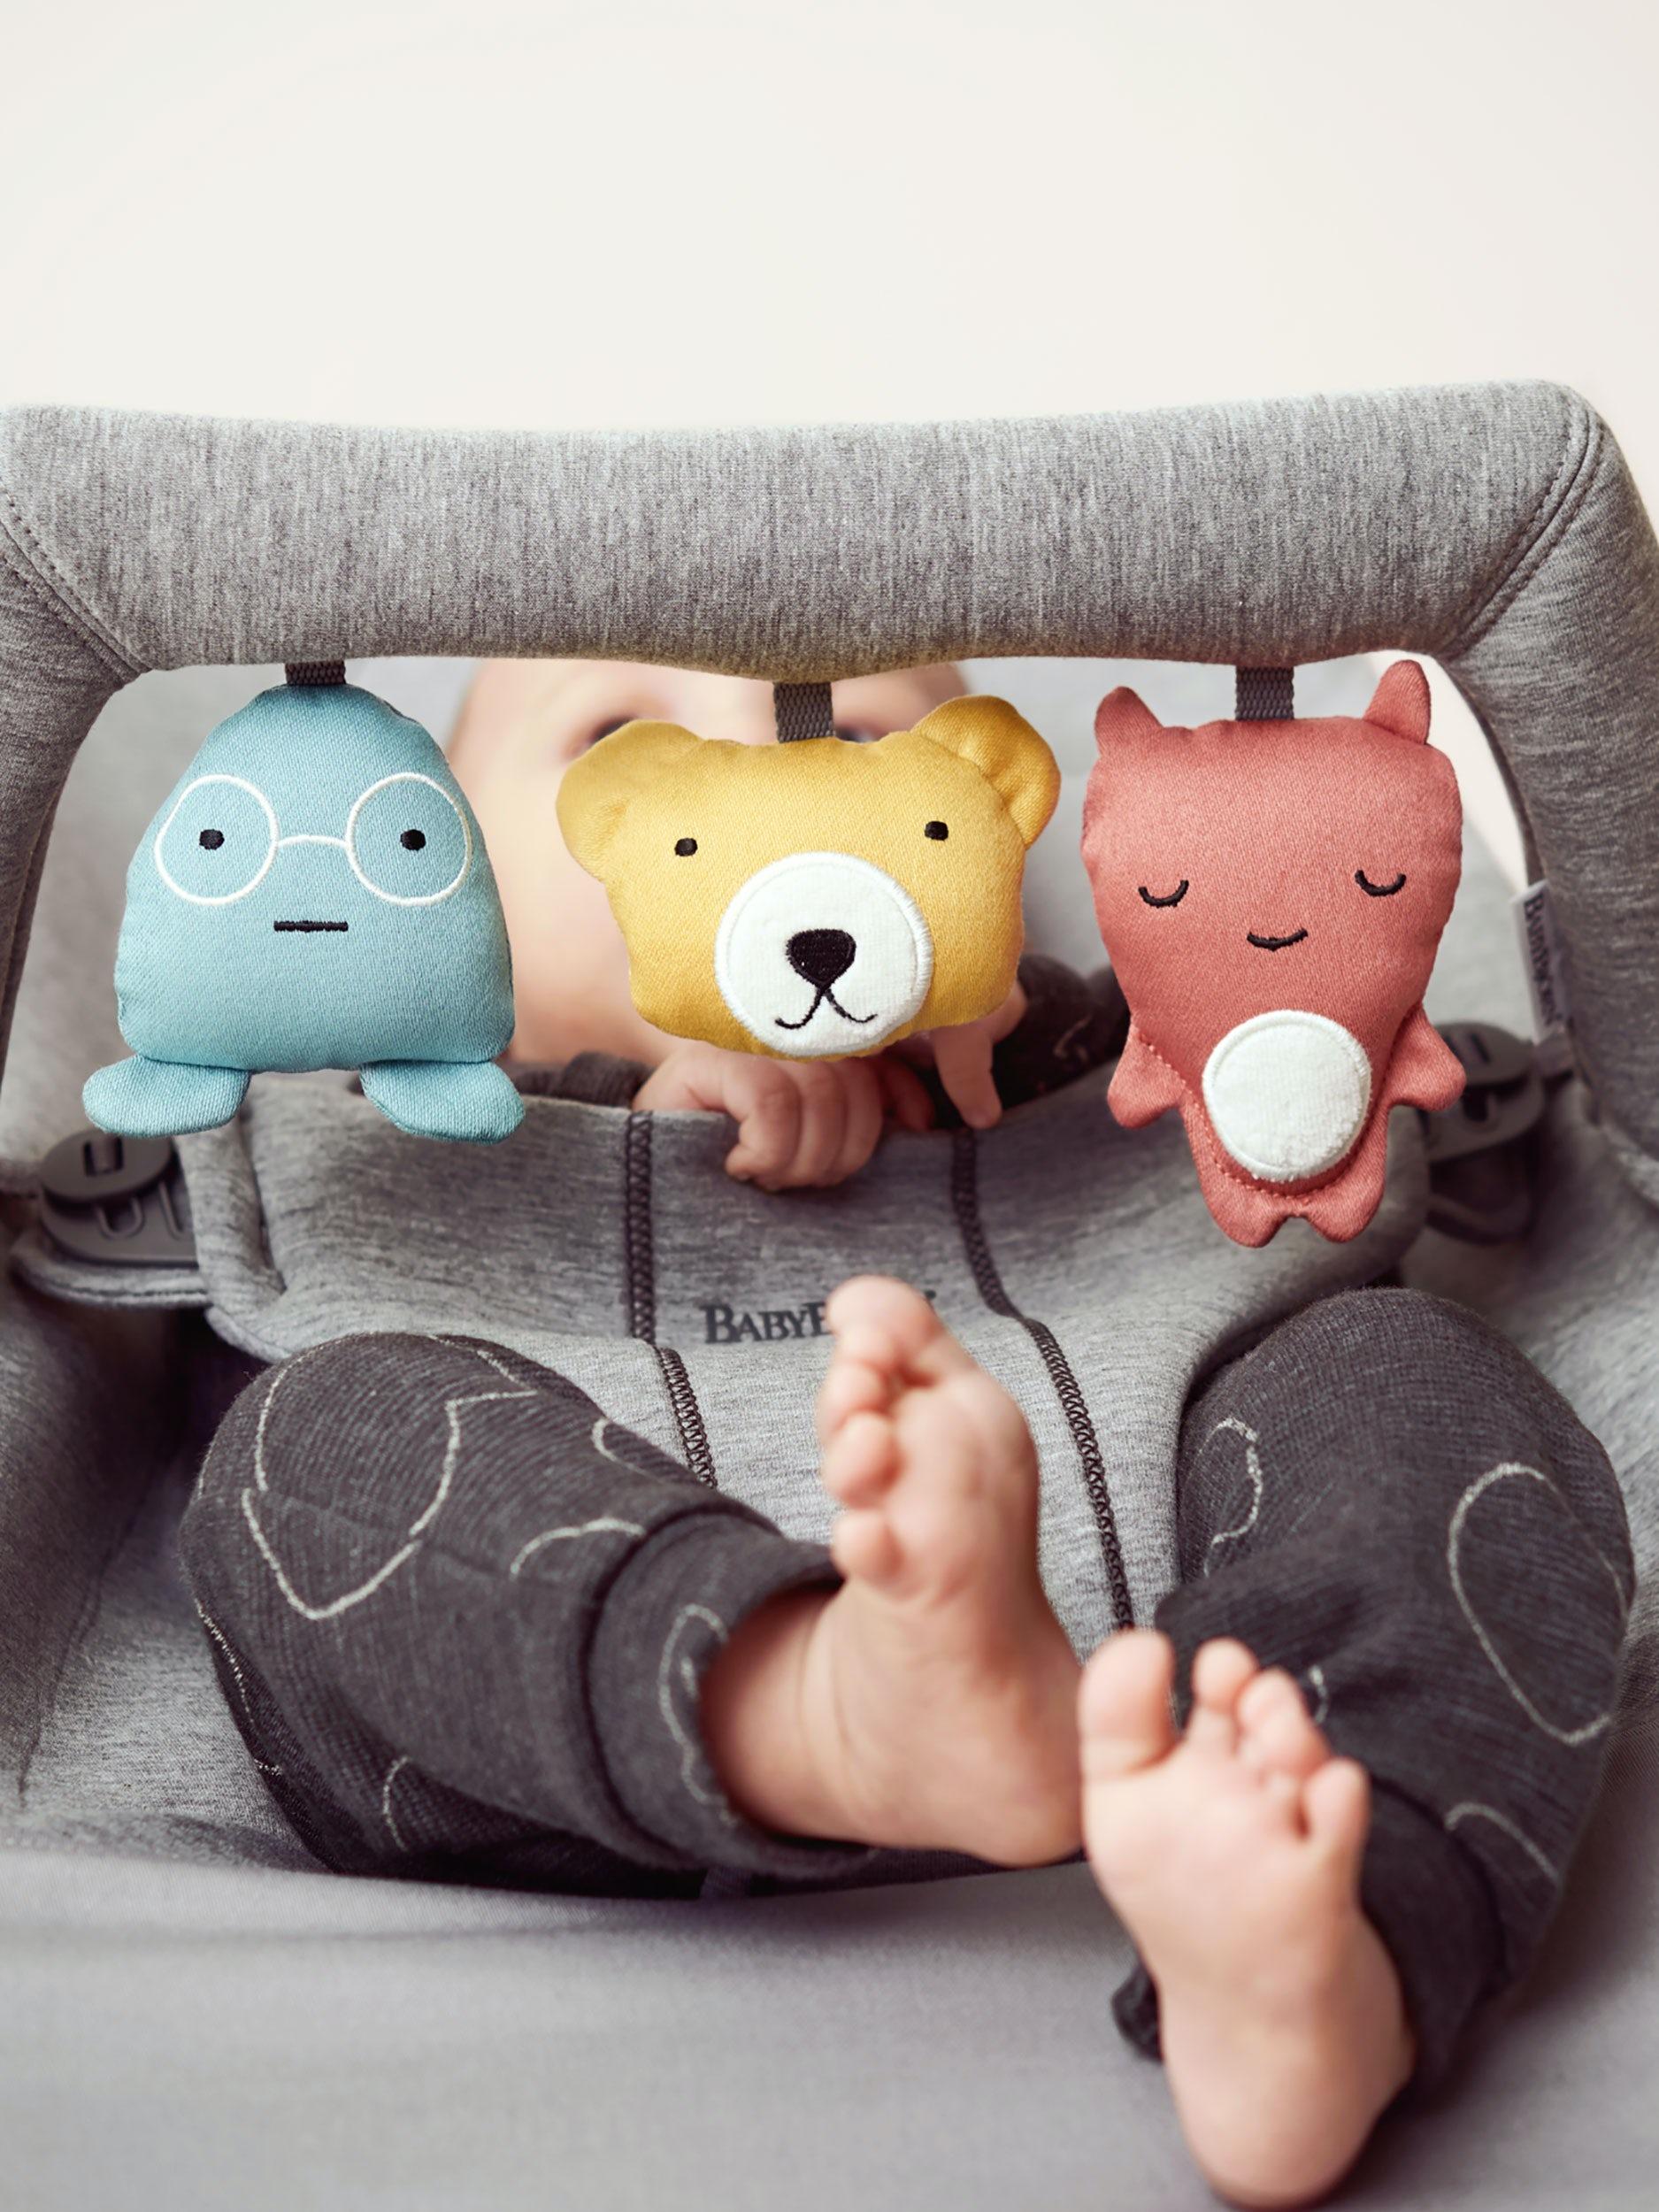 BABYBJ/ÖRN Toy for Bouncer Soft Friends Soft Friends